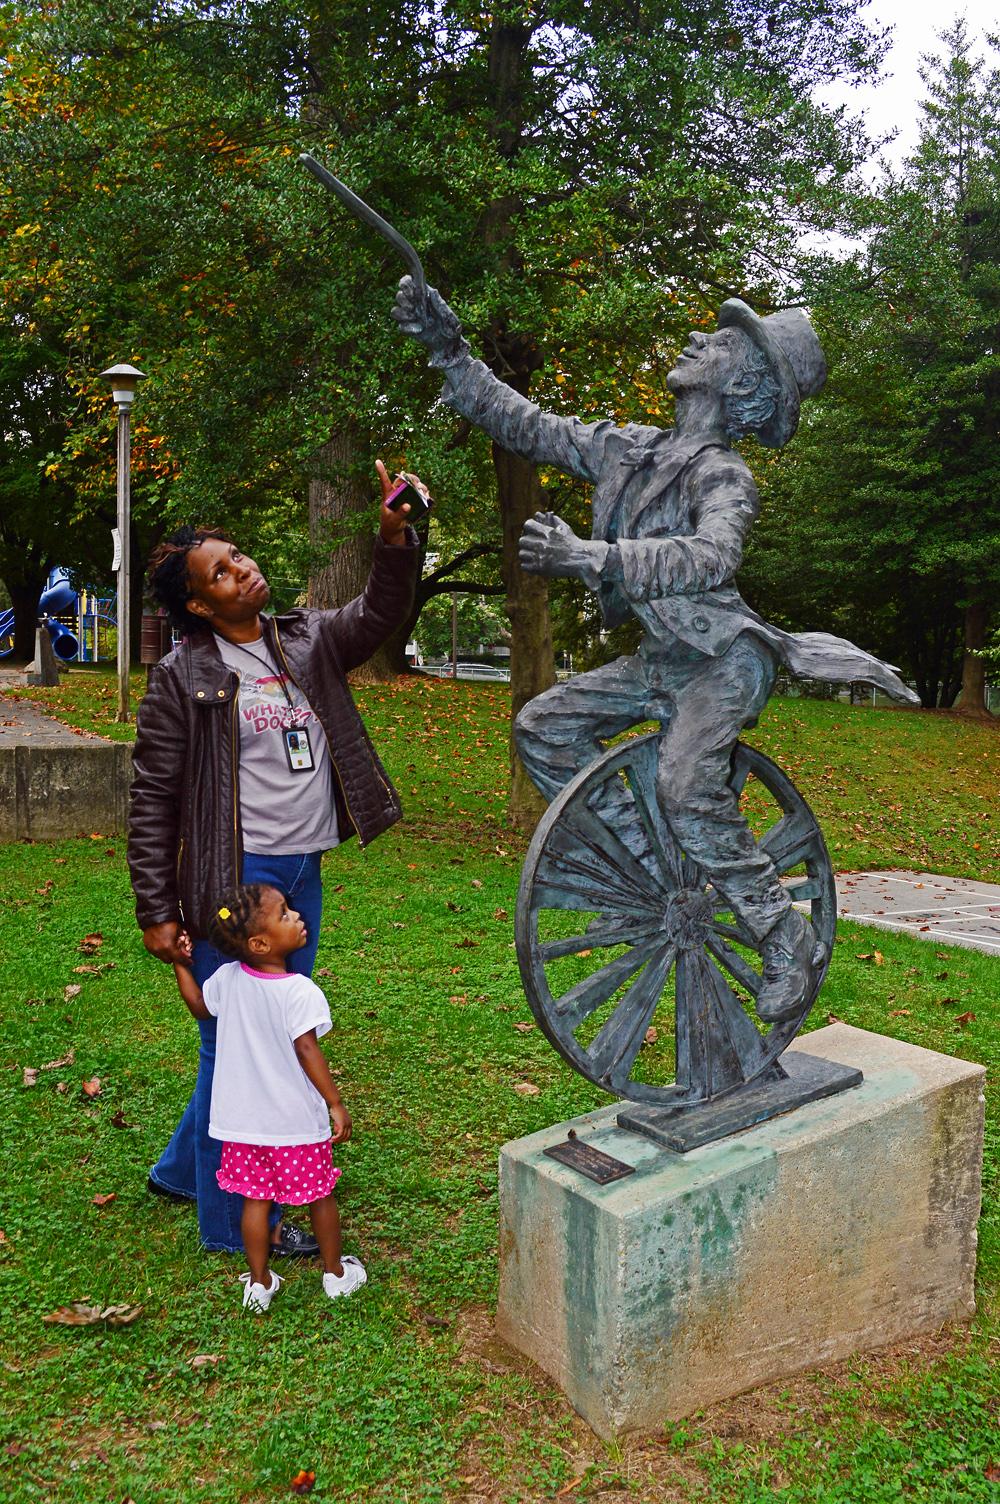 The Juggler, family enjoying the Sculpture!